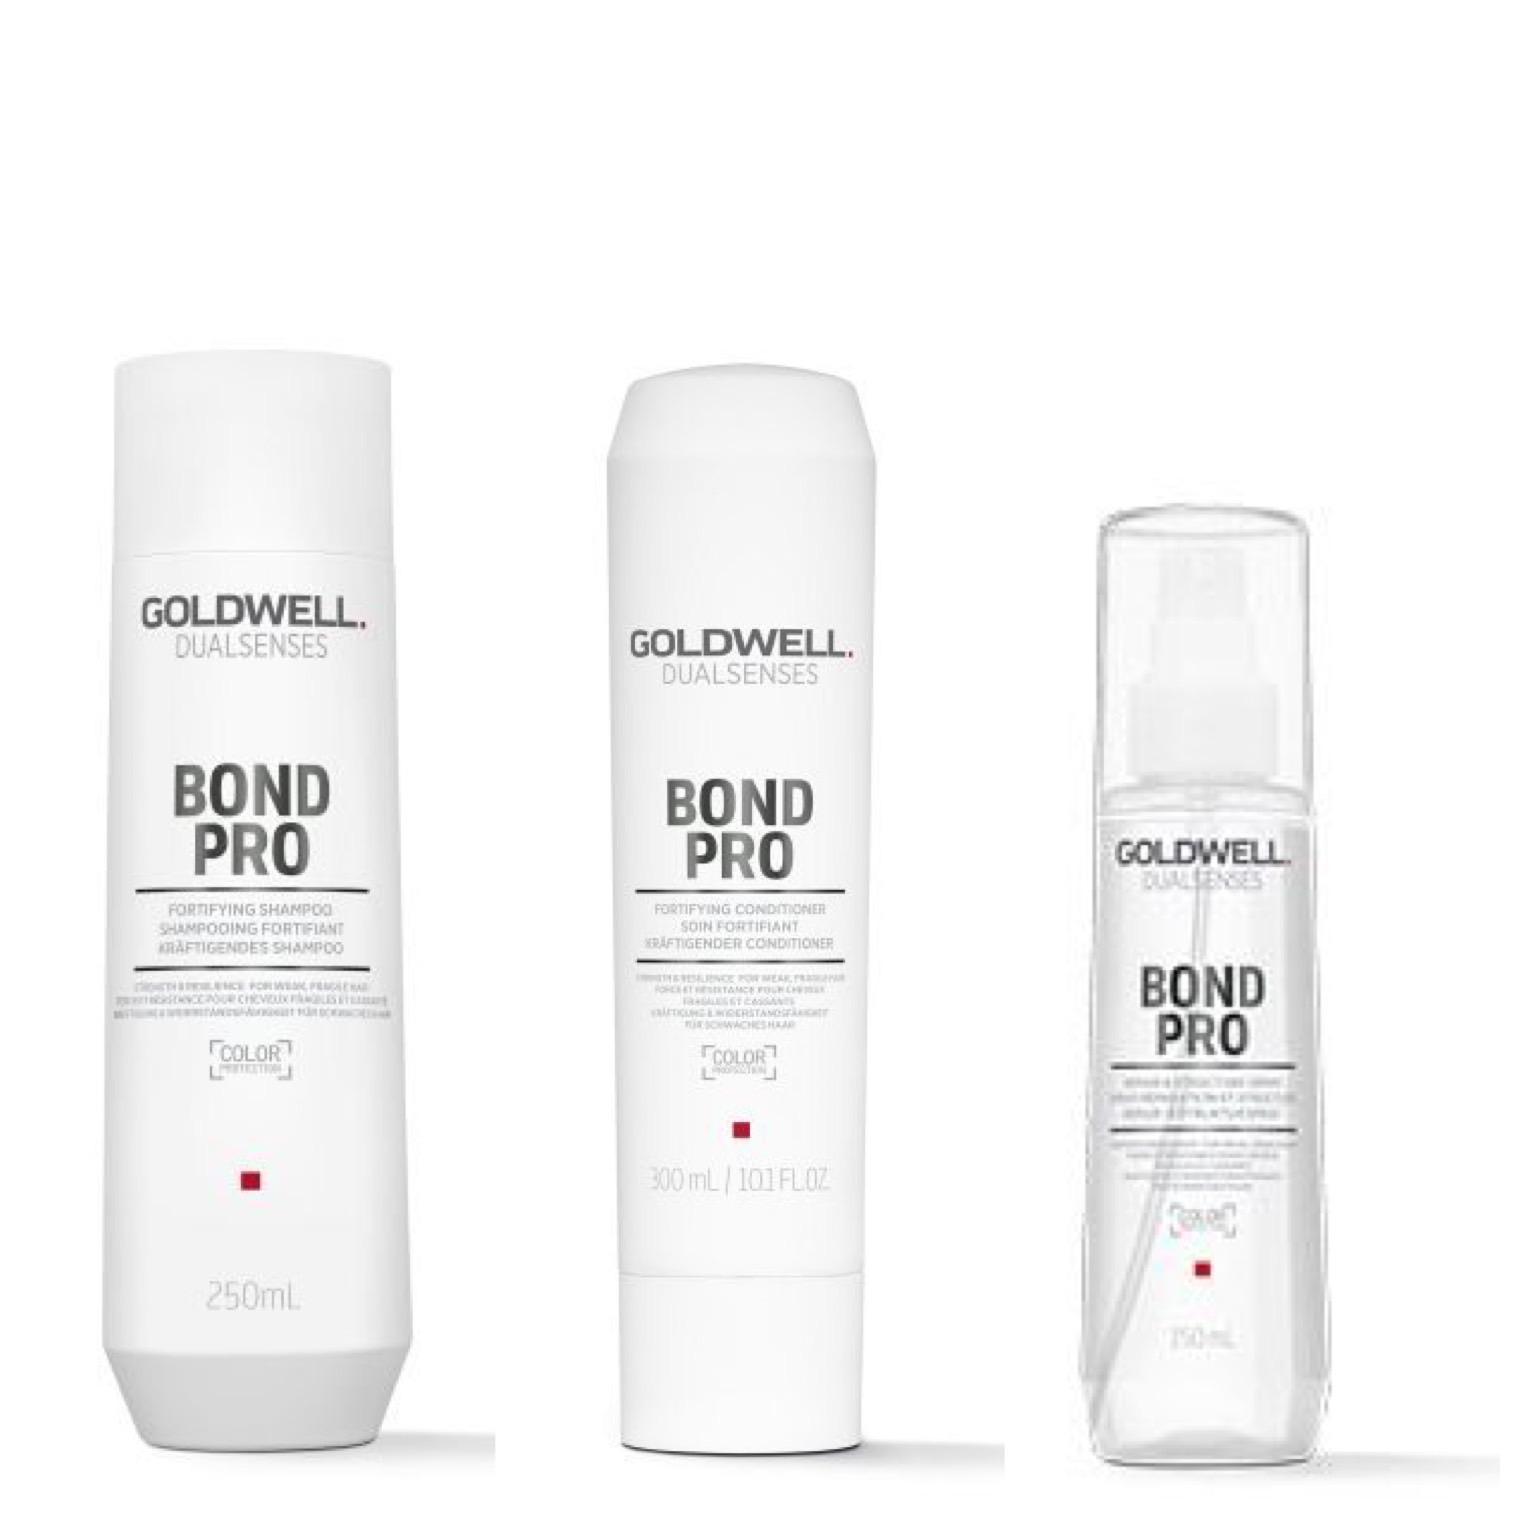 Goldwell Dualsenses Bond Pro Set - Shampoo 250ml + Conditioner 200ml + Repair & Structure Spray 150ml